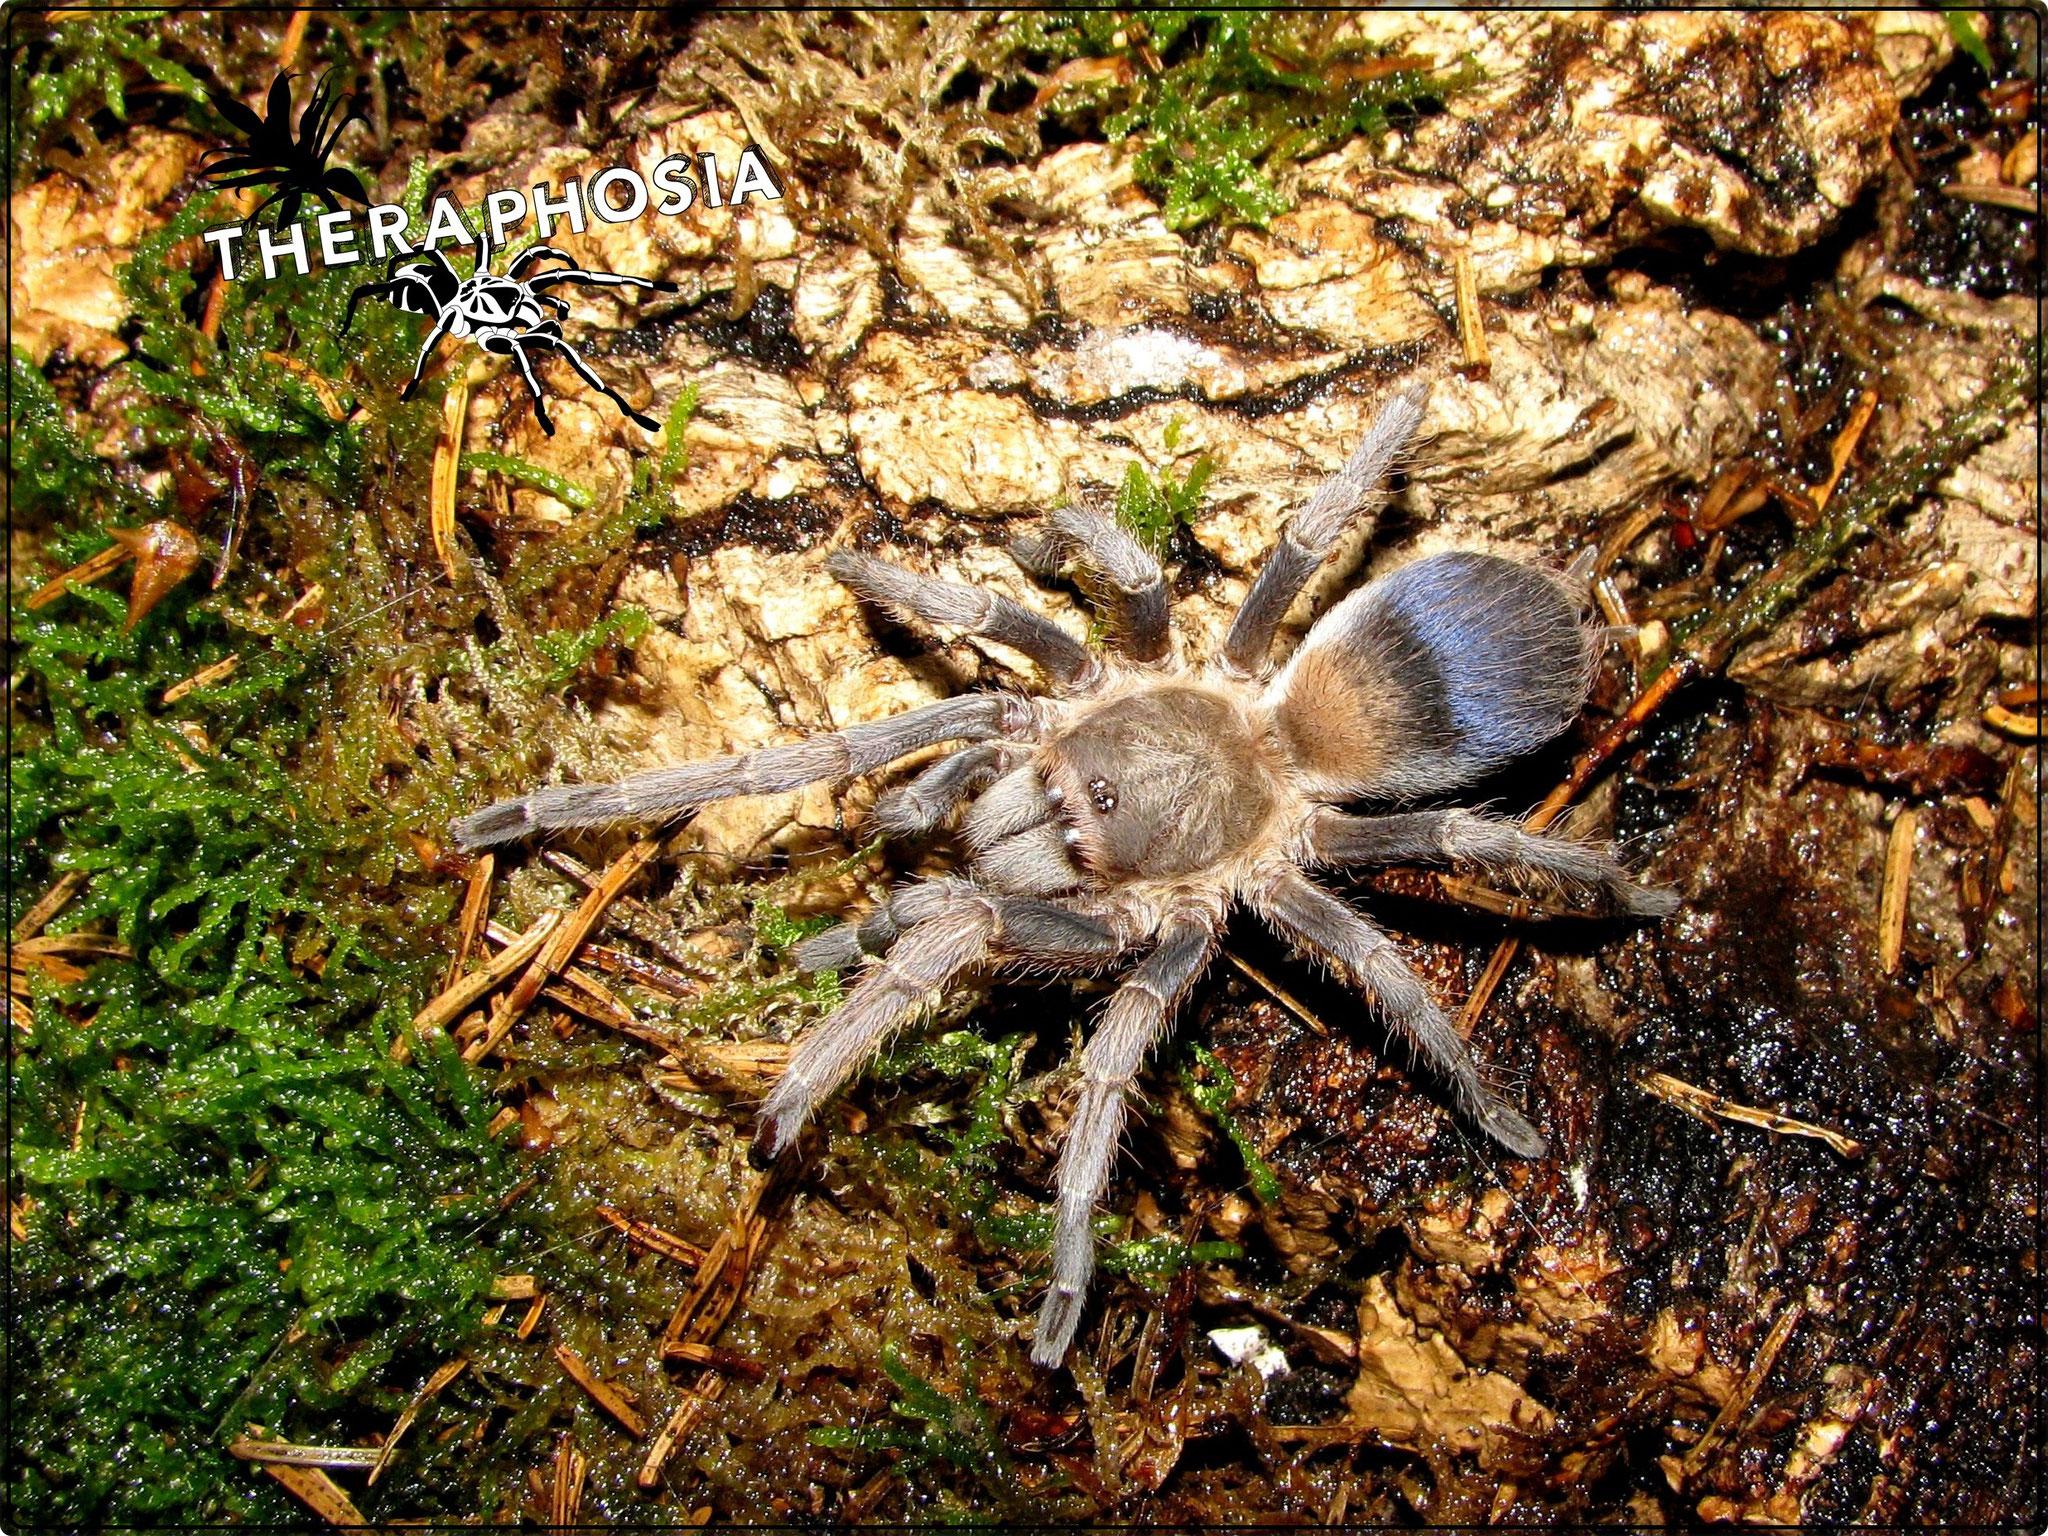 0.1 Pseudhapalopus sp Blue